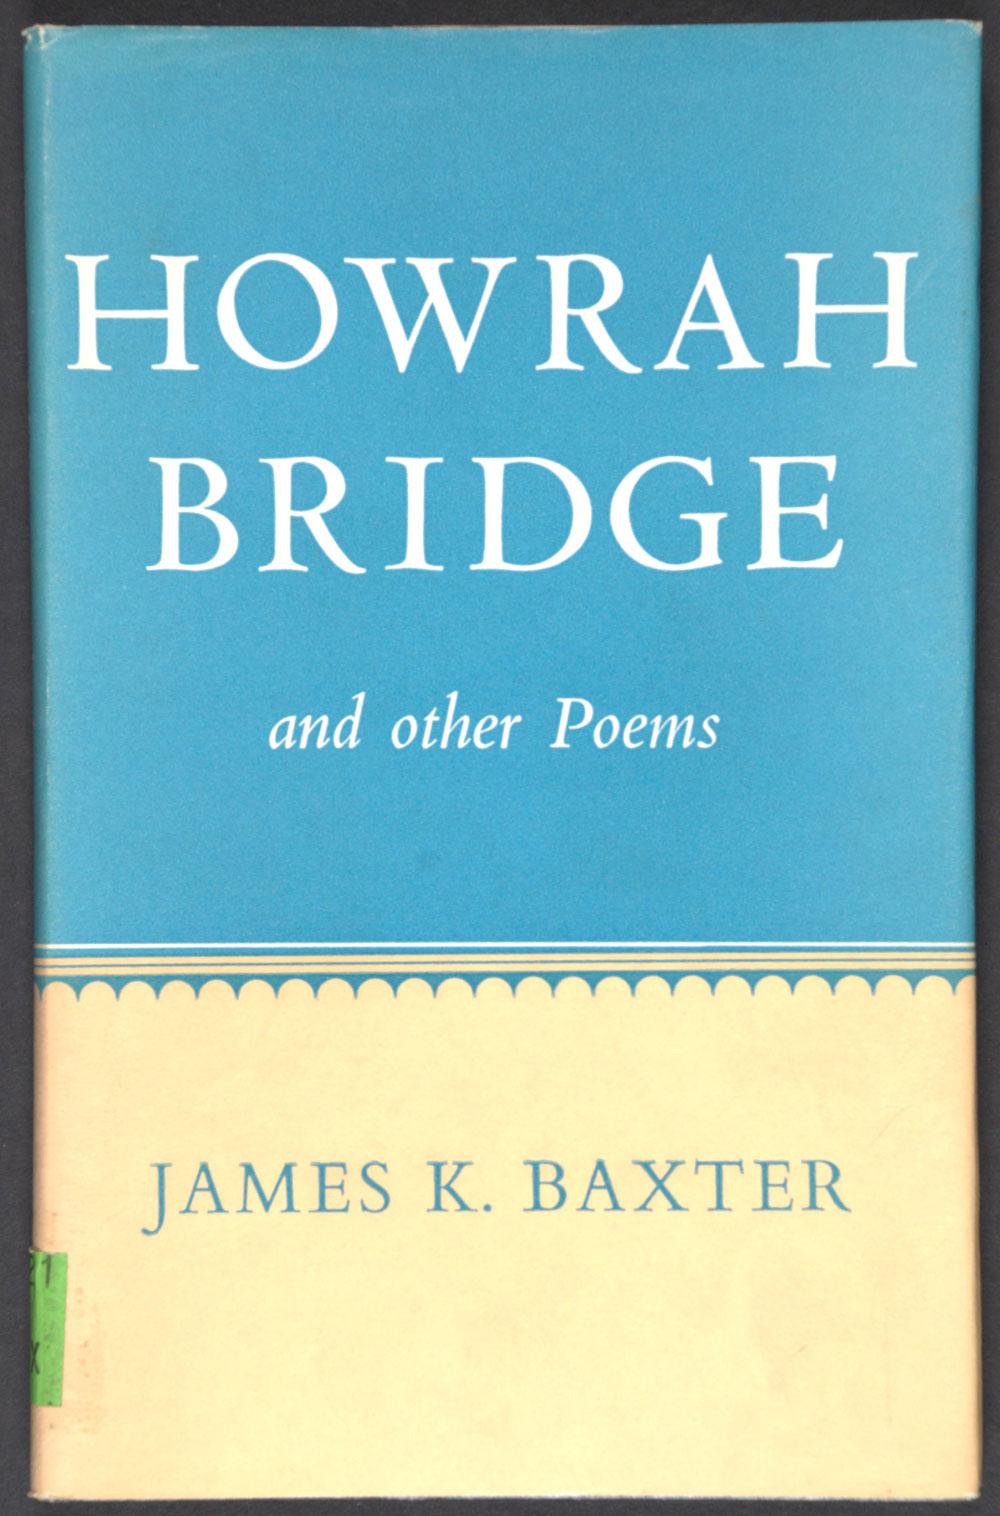 James K. Baxter. <em>Howrah Bridge and other poems.</em> London: Oxford University Press, 1961.